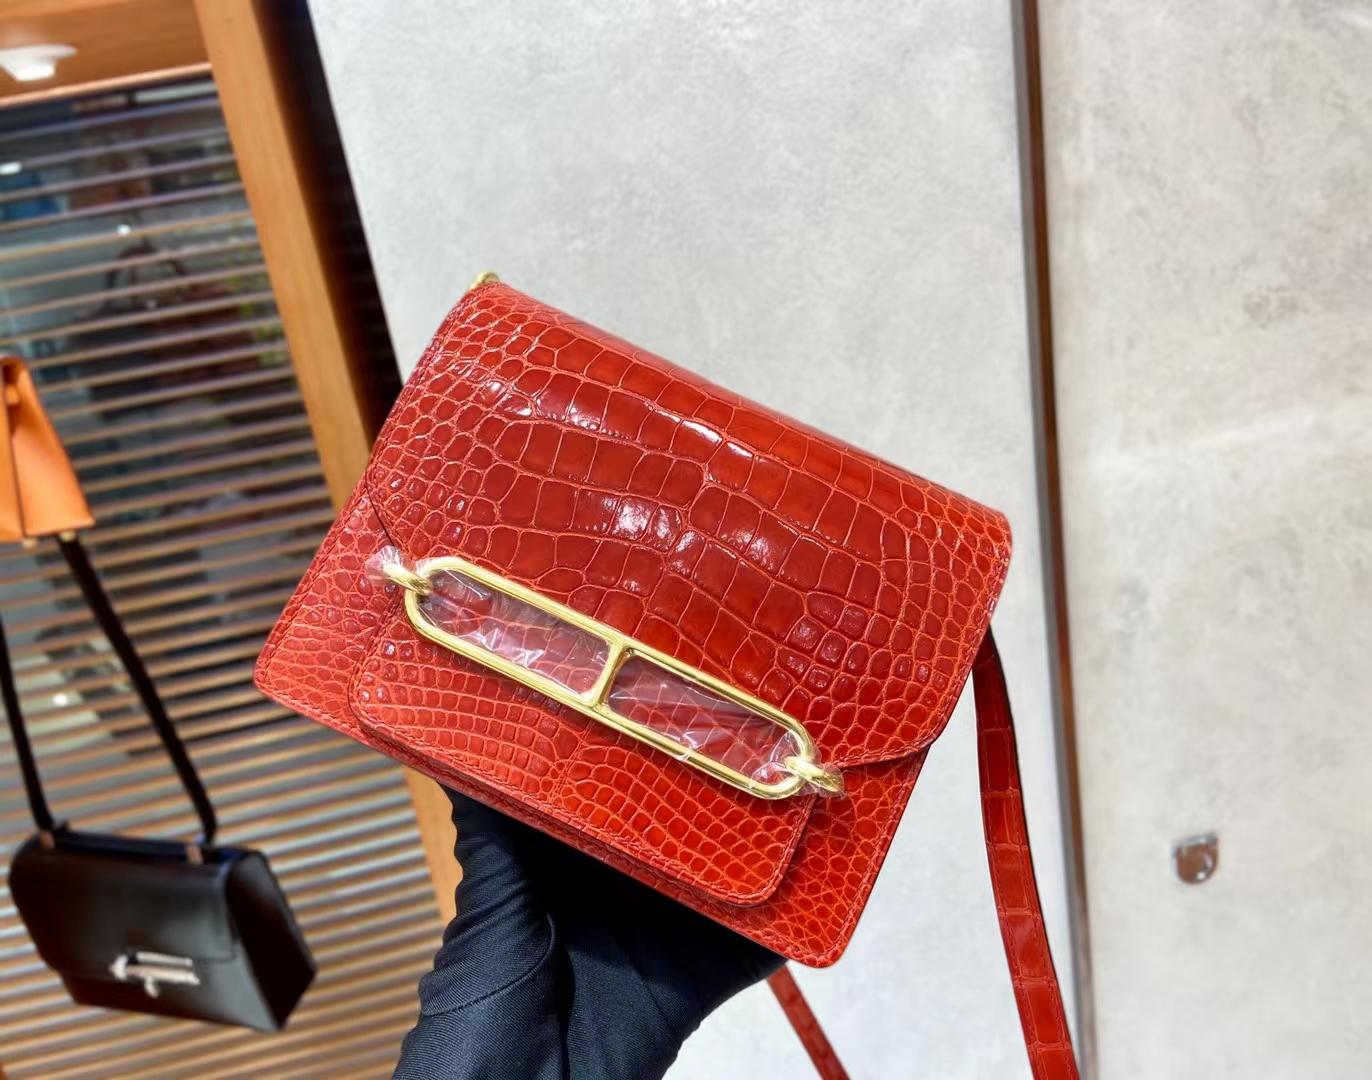 Hermès(爱马仕)Roulis 猪鼻子 亮面鳄鱼 95 法拉利红 金扣 18cm 顶级纯手工